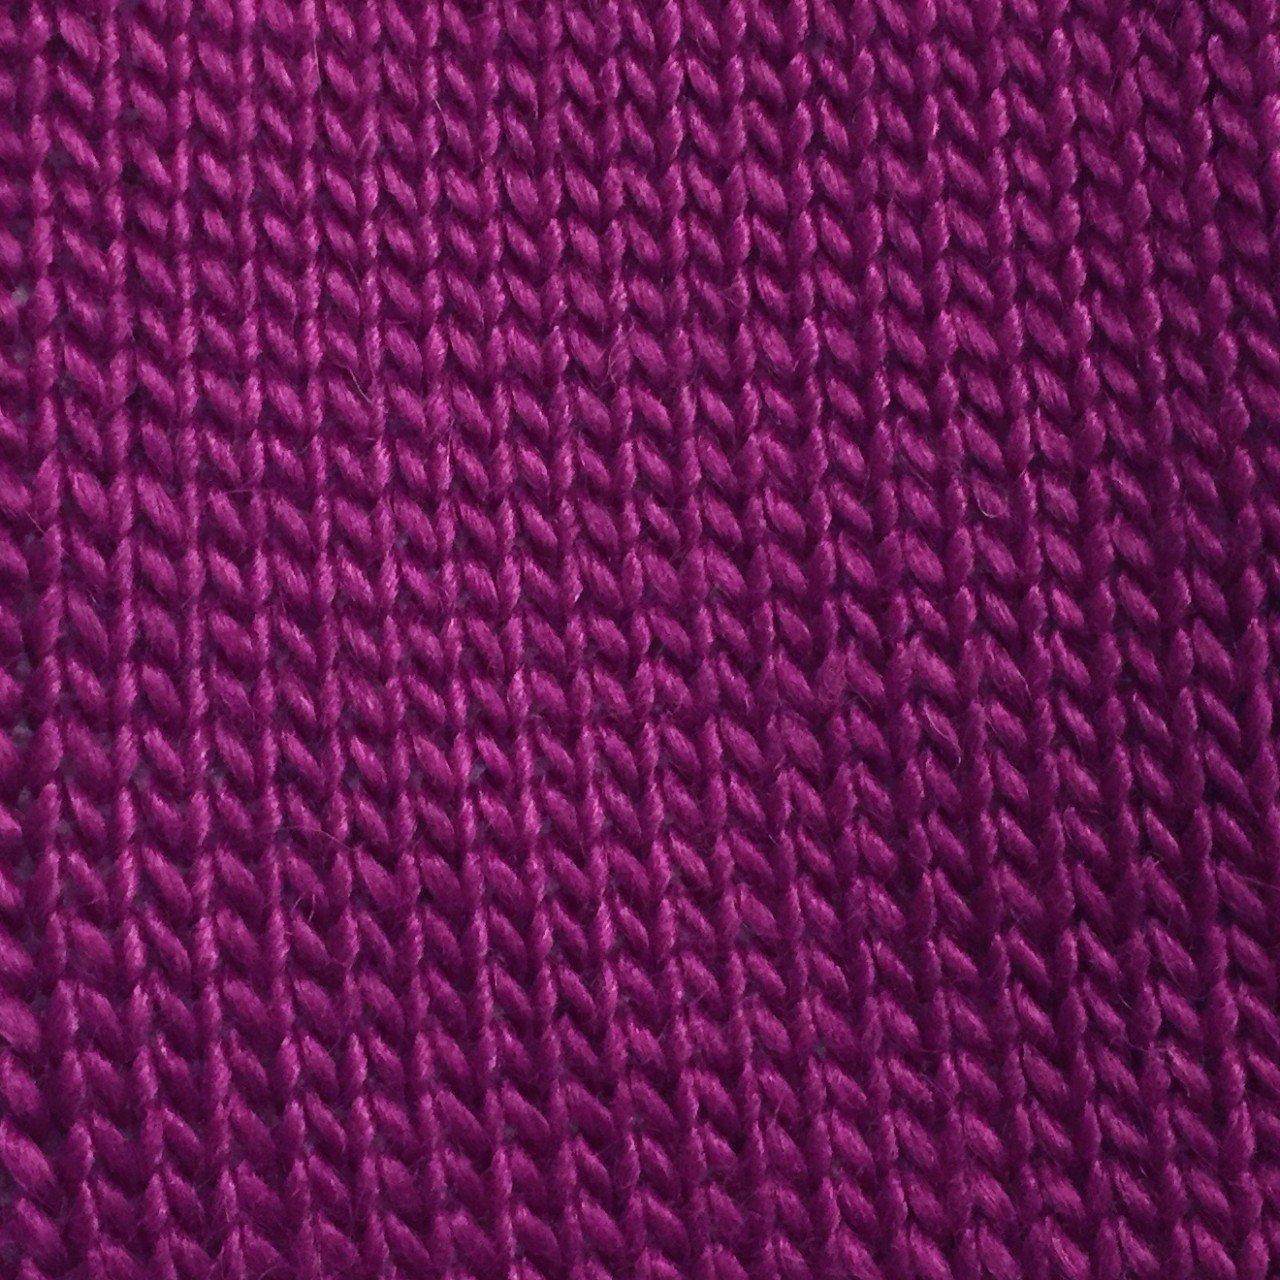 Astral Alpaca Blend Yarn - Andromeda AYC-8890